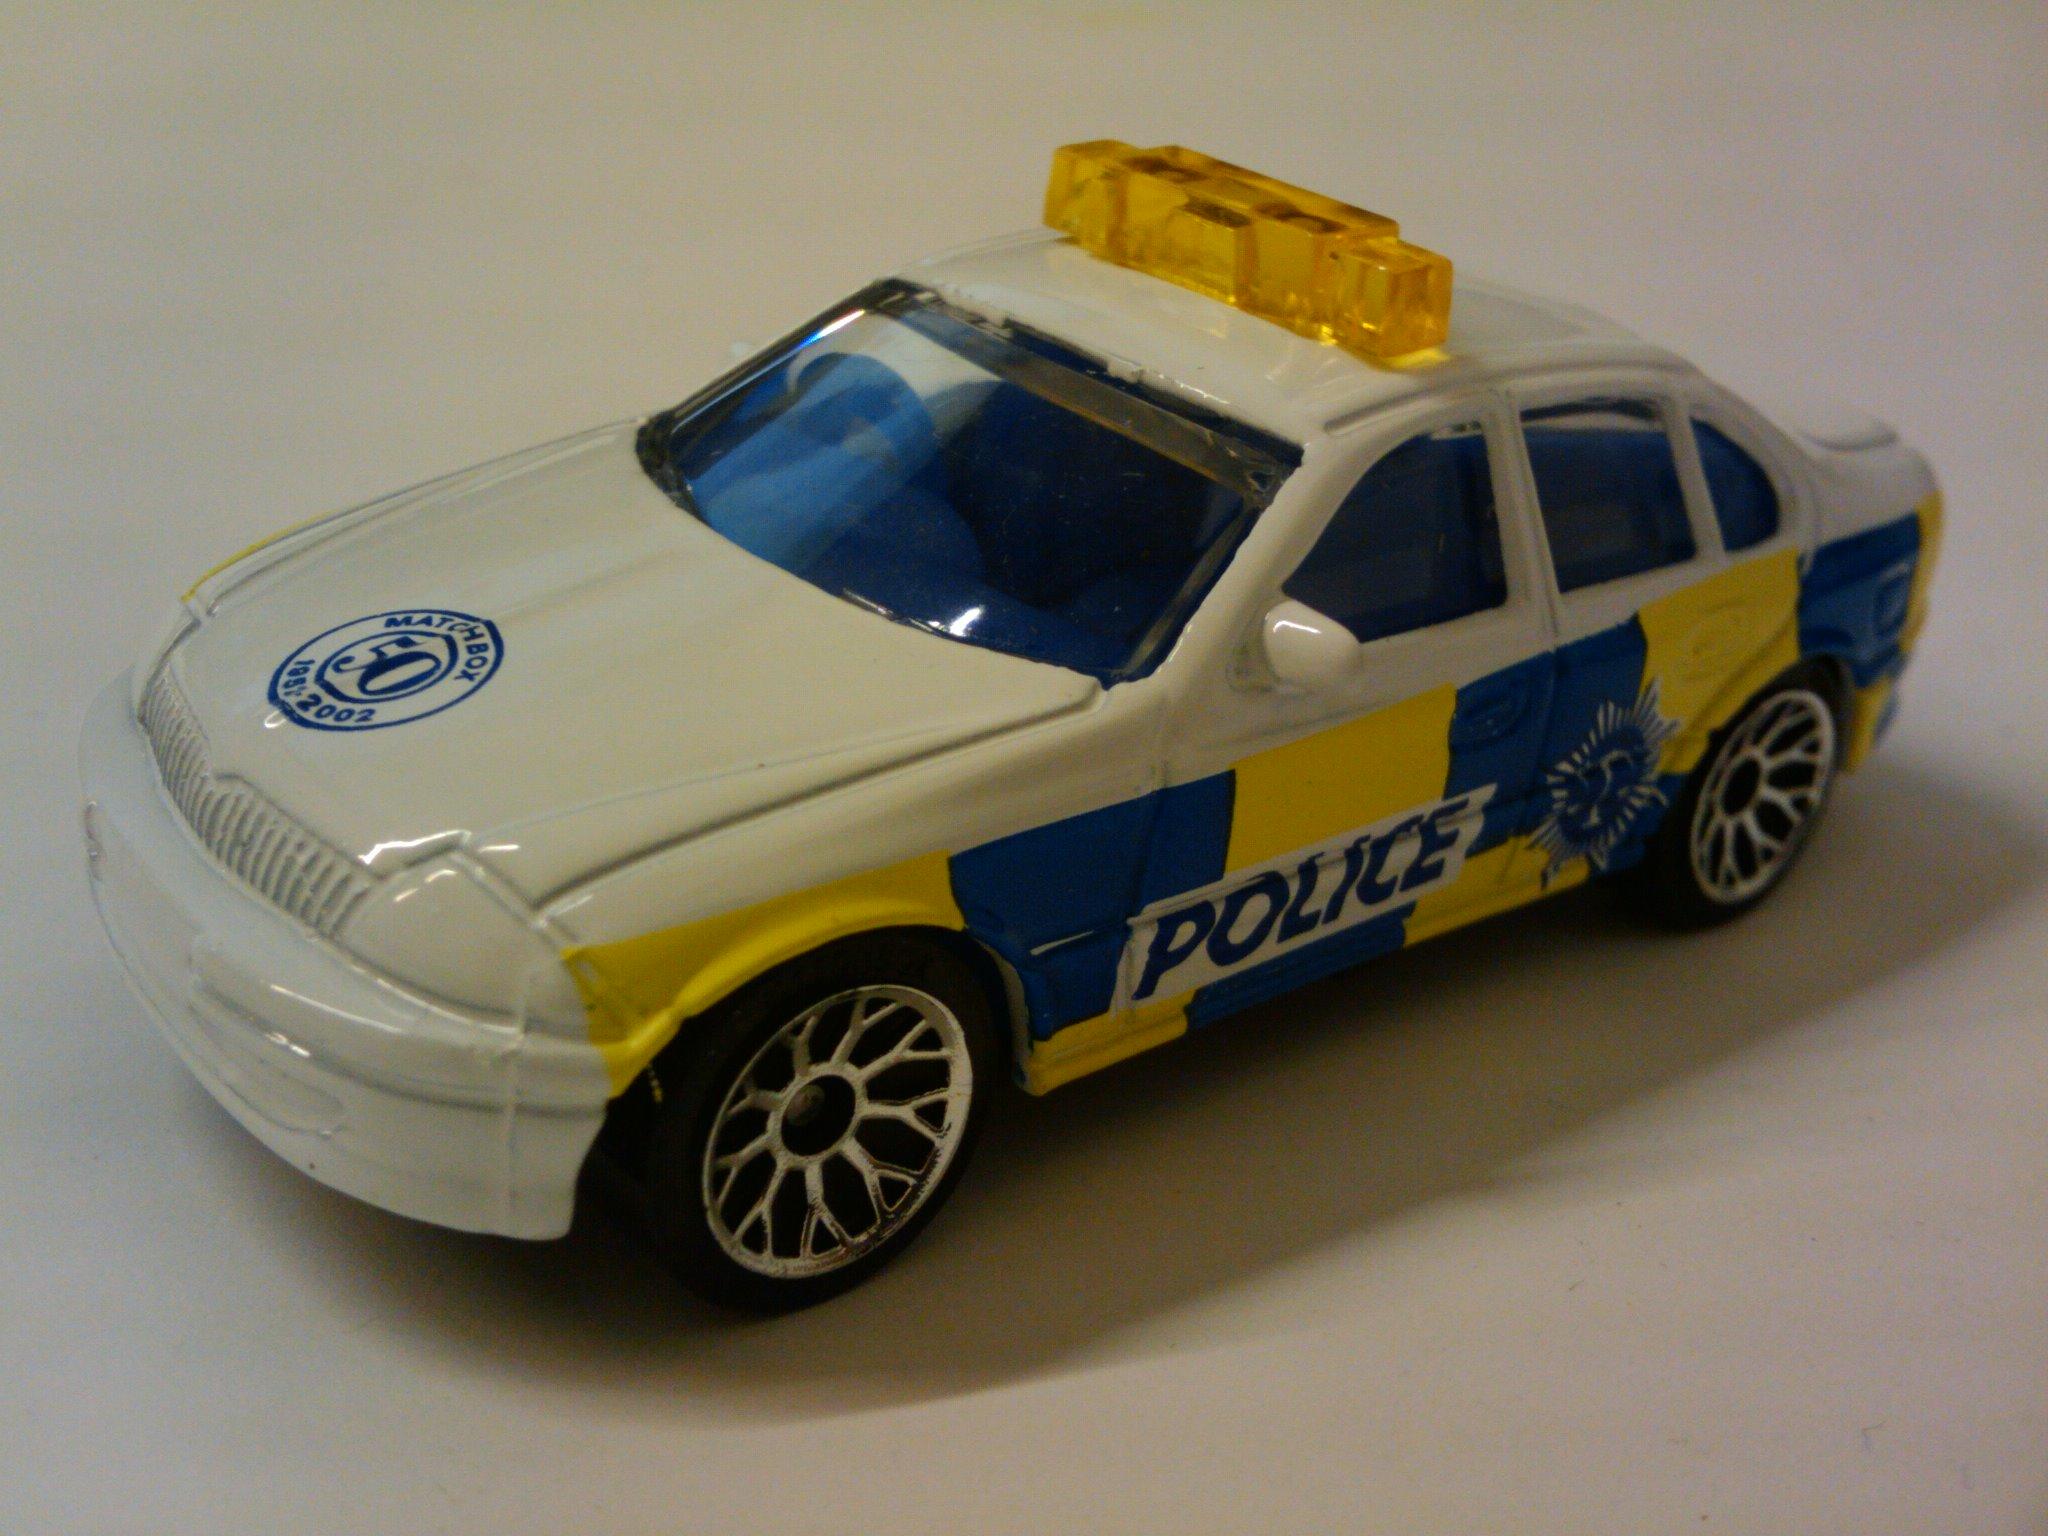 50th Ford Falcon Police.jpg